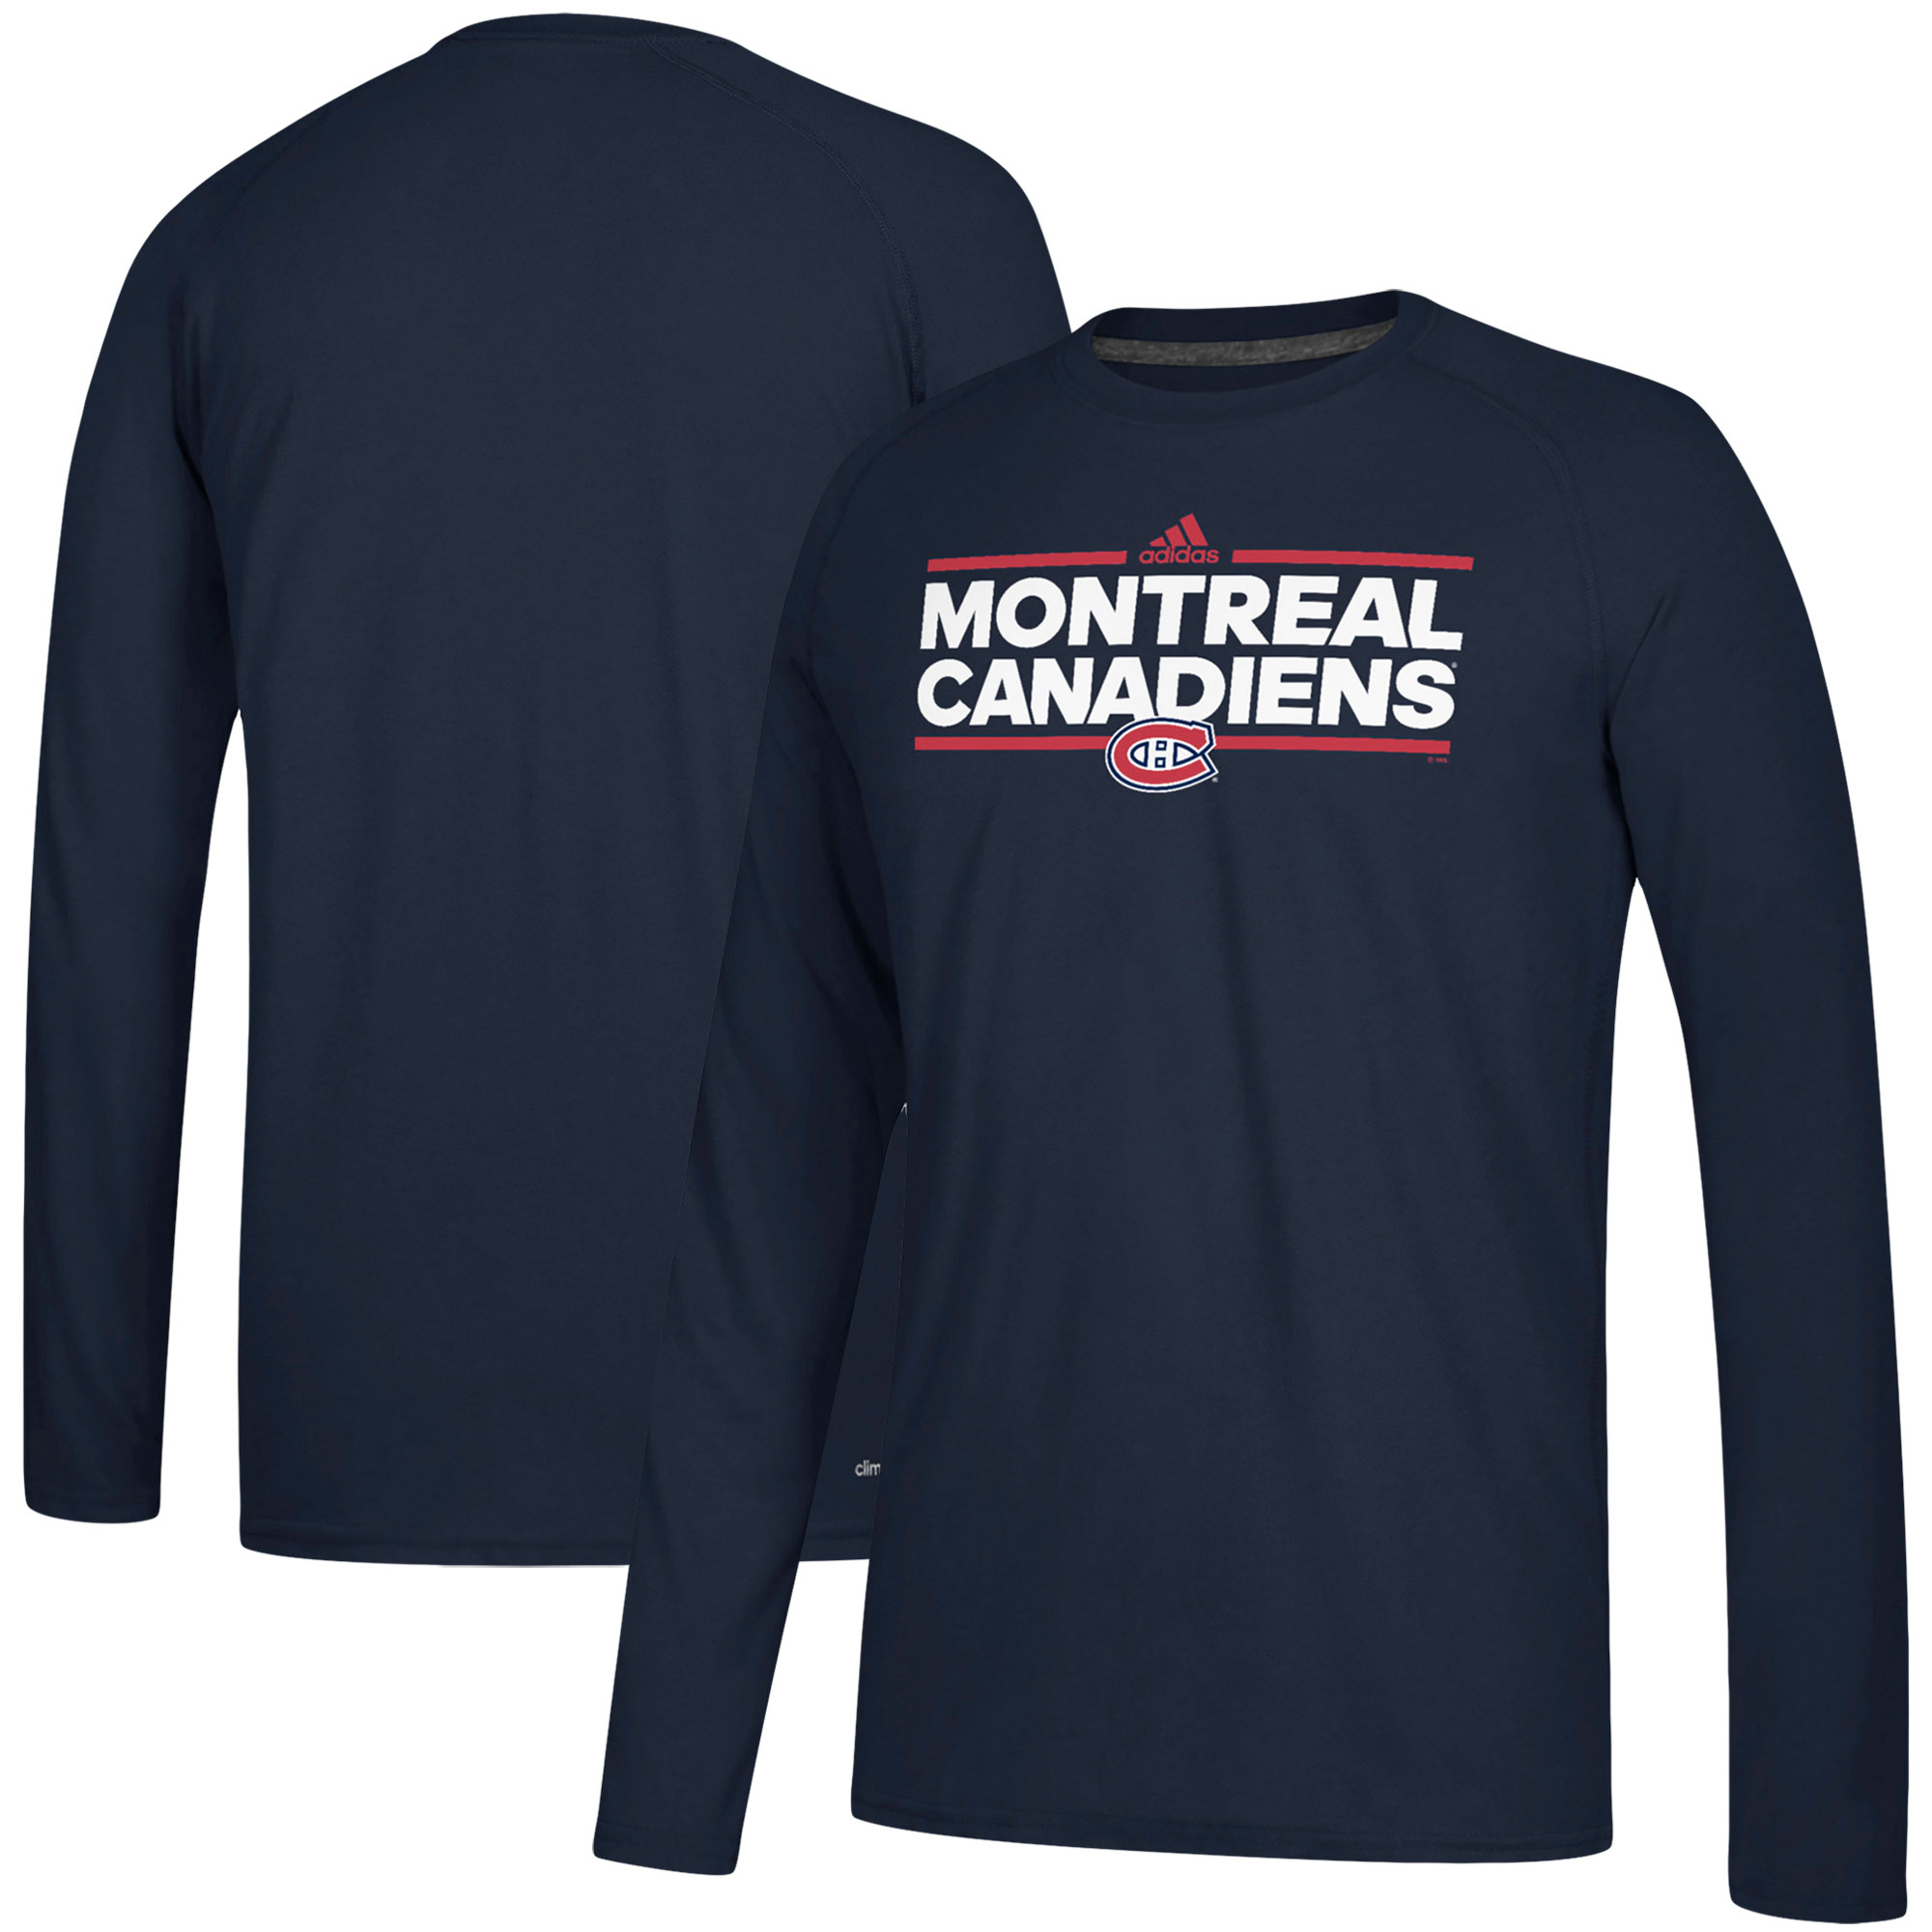 Montreal Canadiens adidas Dassler climalite Long Sleeve Raglan T-Shirt Navy